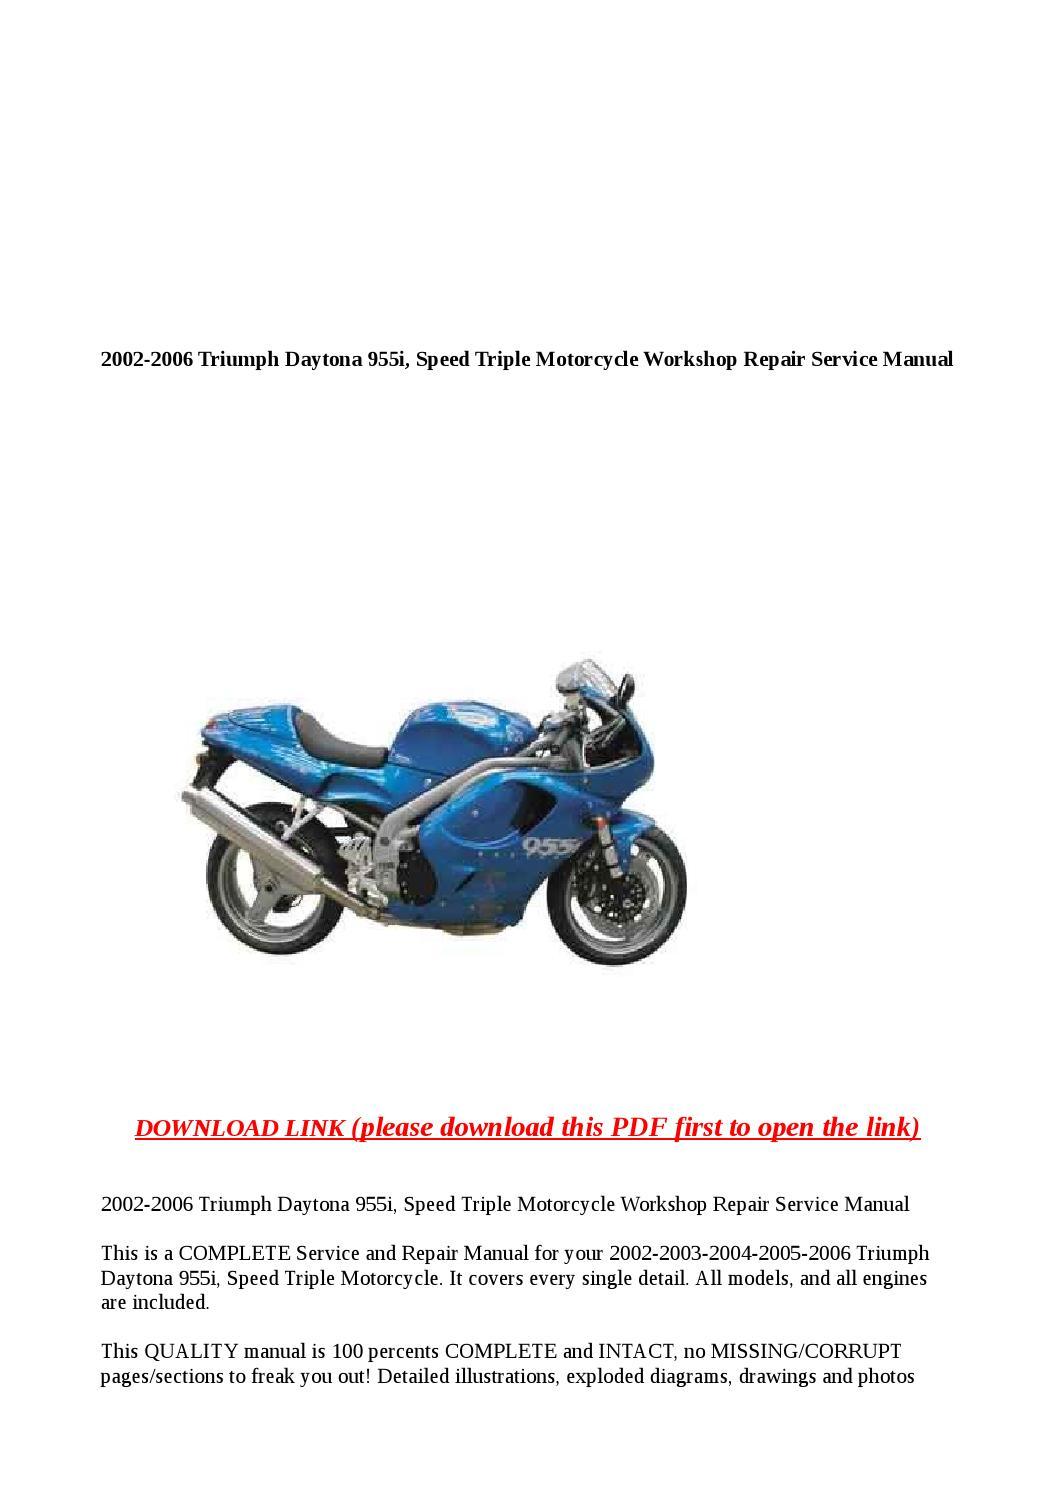 2002 2006 triumph daytona 955i speed triple motorcycle. Black Bedroom Furniture Sets. Home Design Ideas